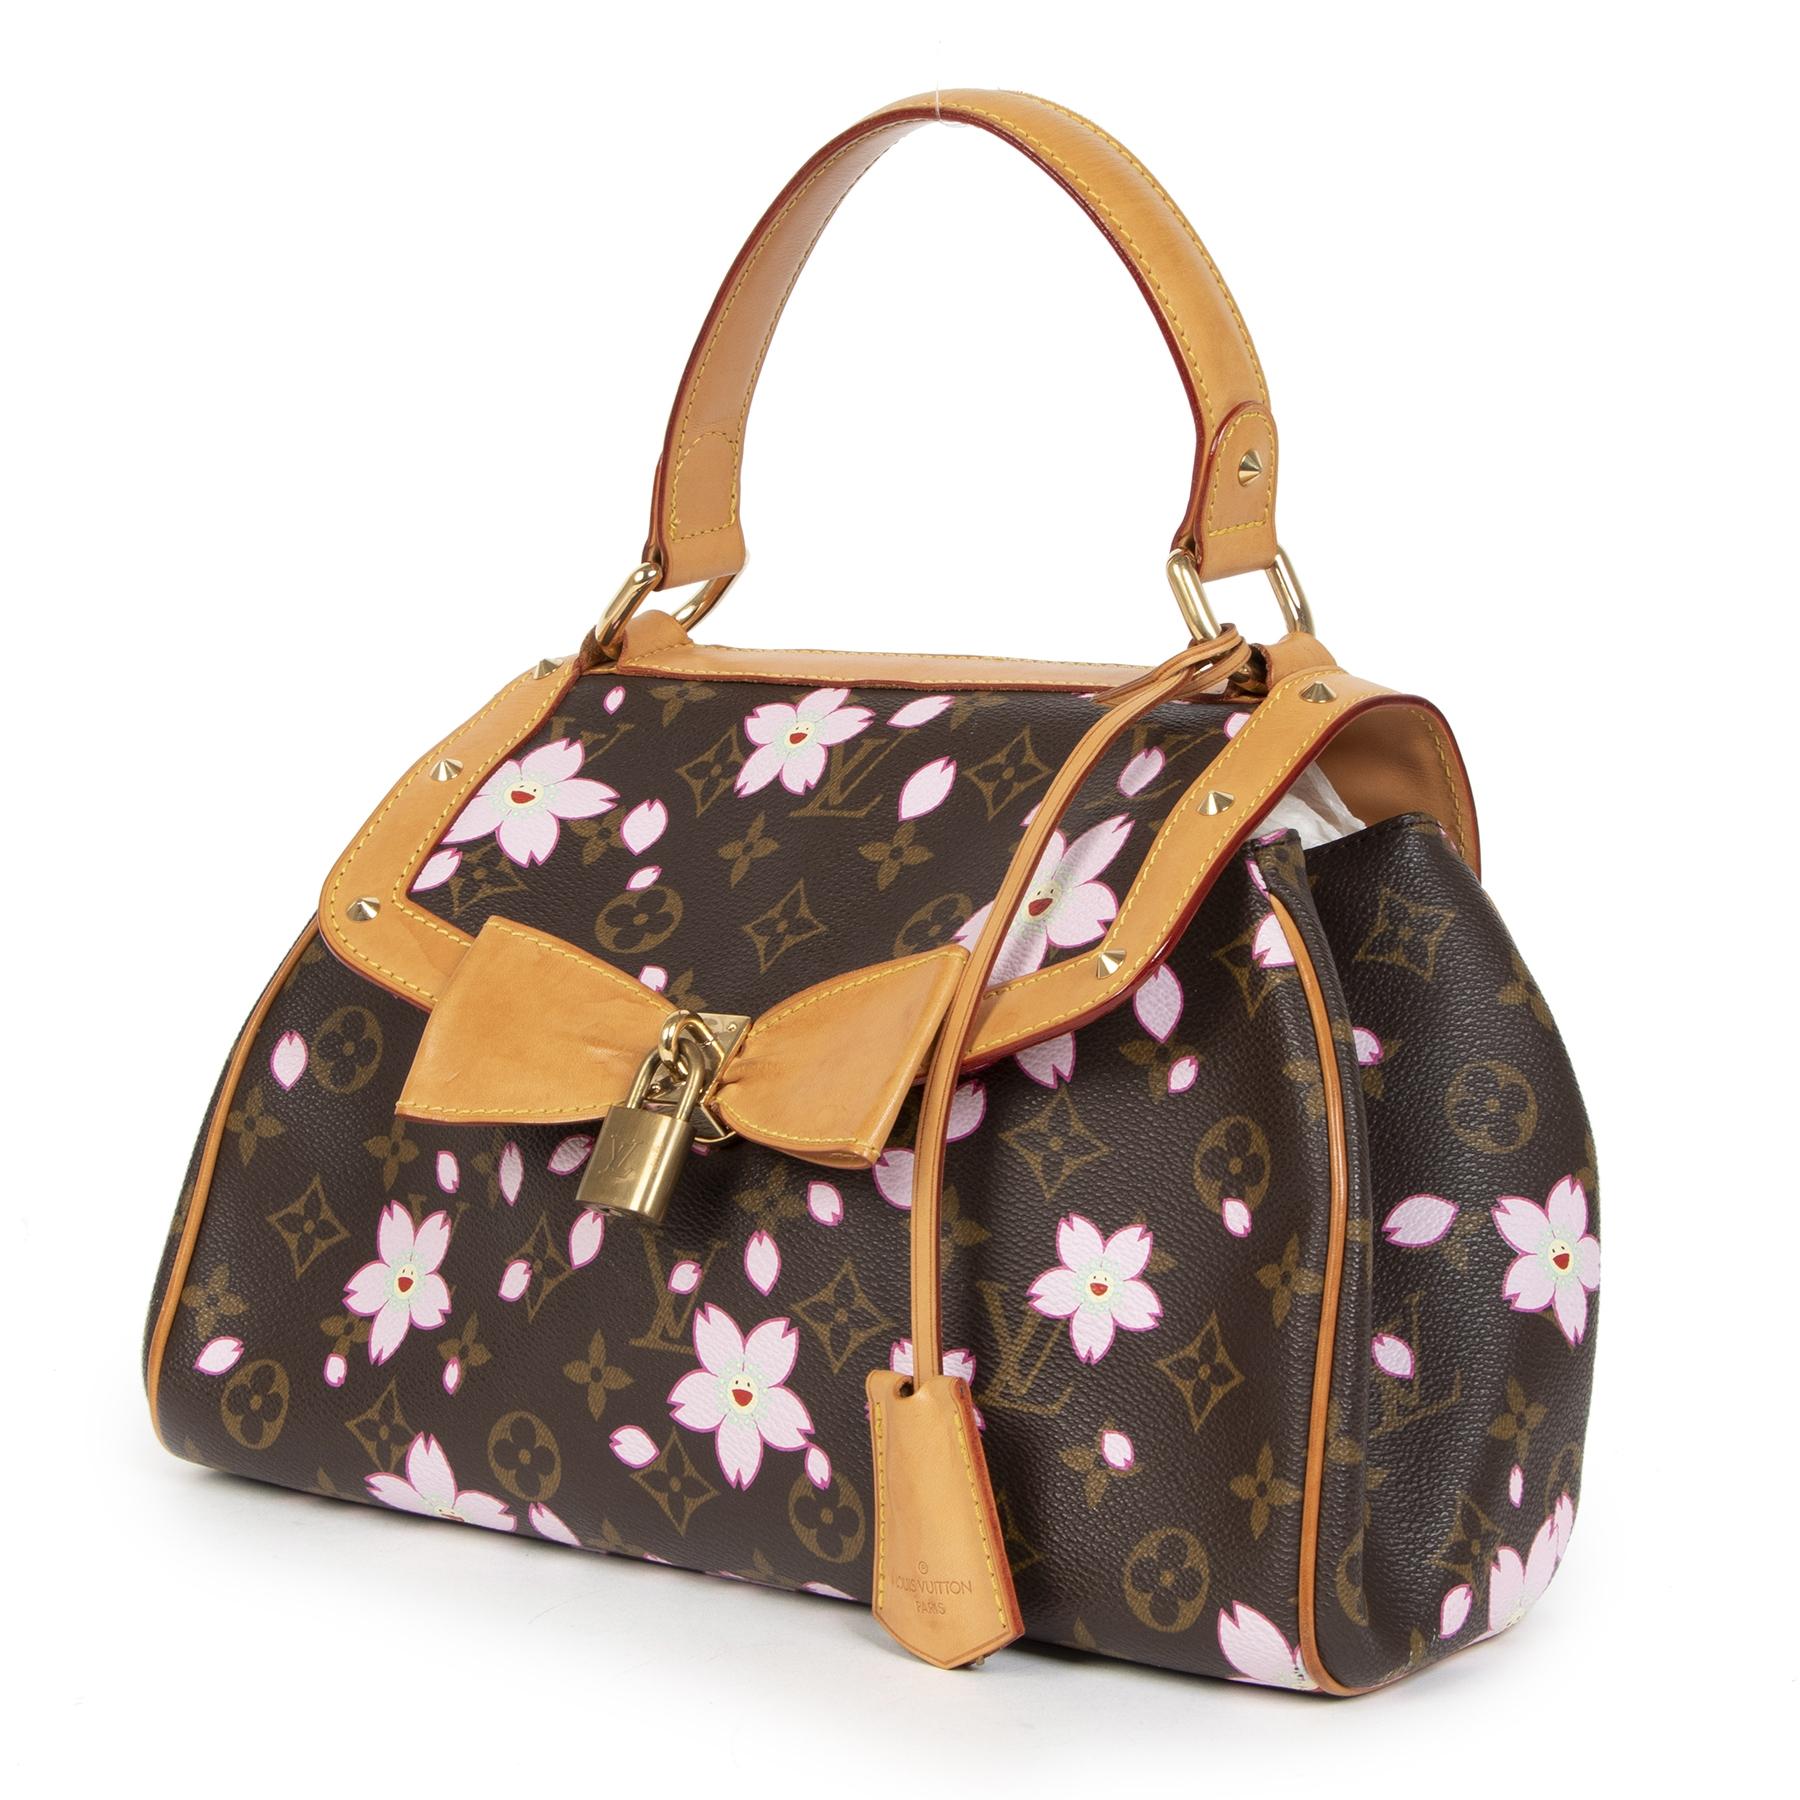 Authentieke tweedehands vintage Louis Vuitton Cherry Blossom Takashi Murakami Top Handle Bag Koop online webshop LabelLOV